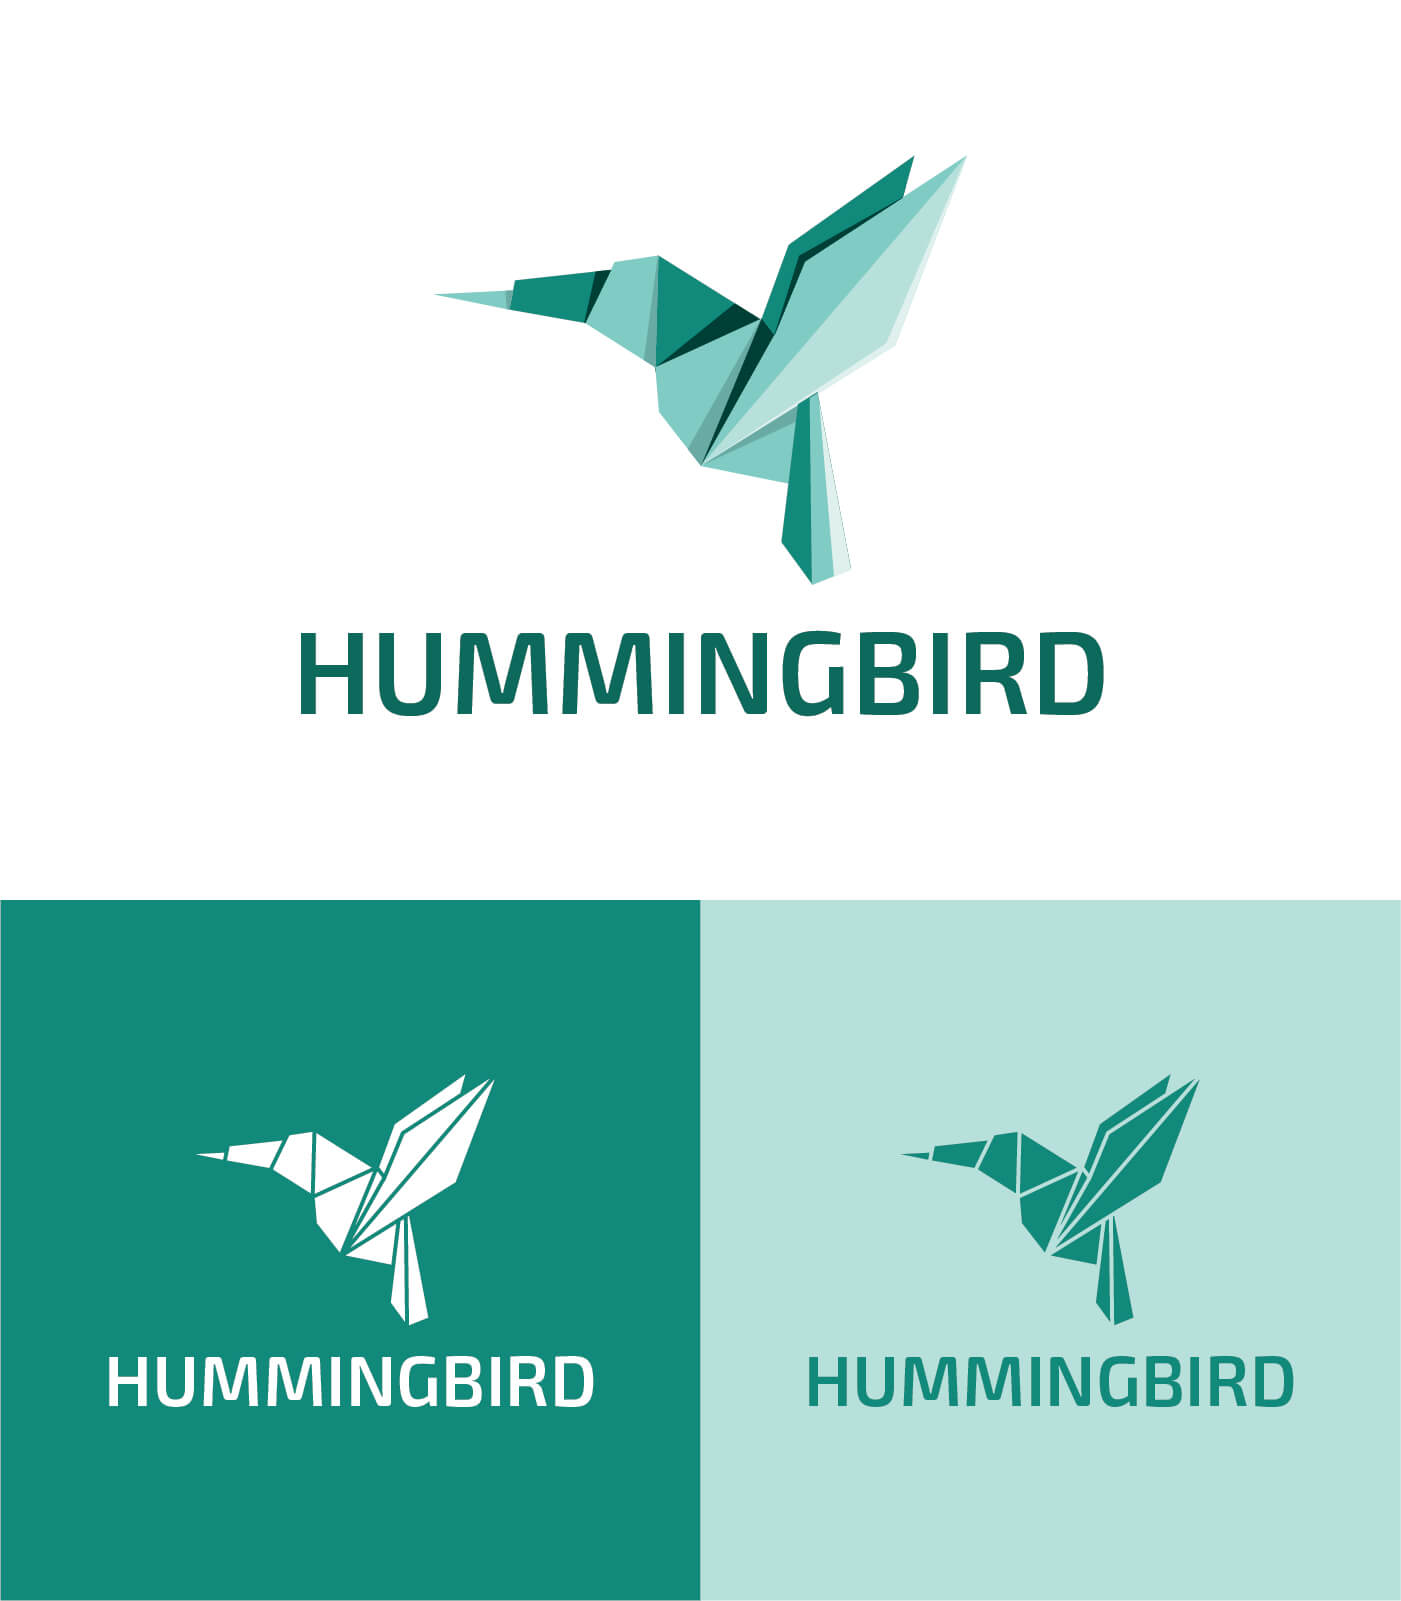 Hummingbird Logo Download Free Vector Art Stock Graphics Images